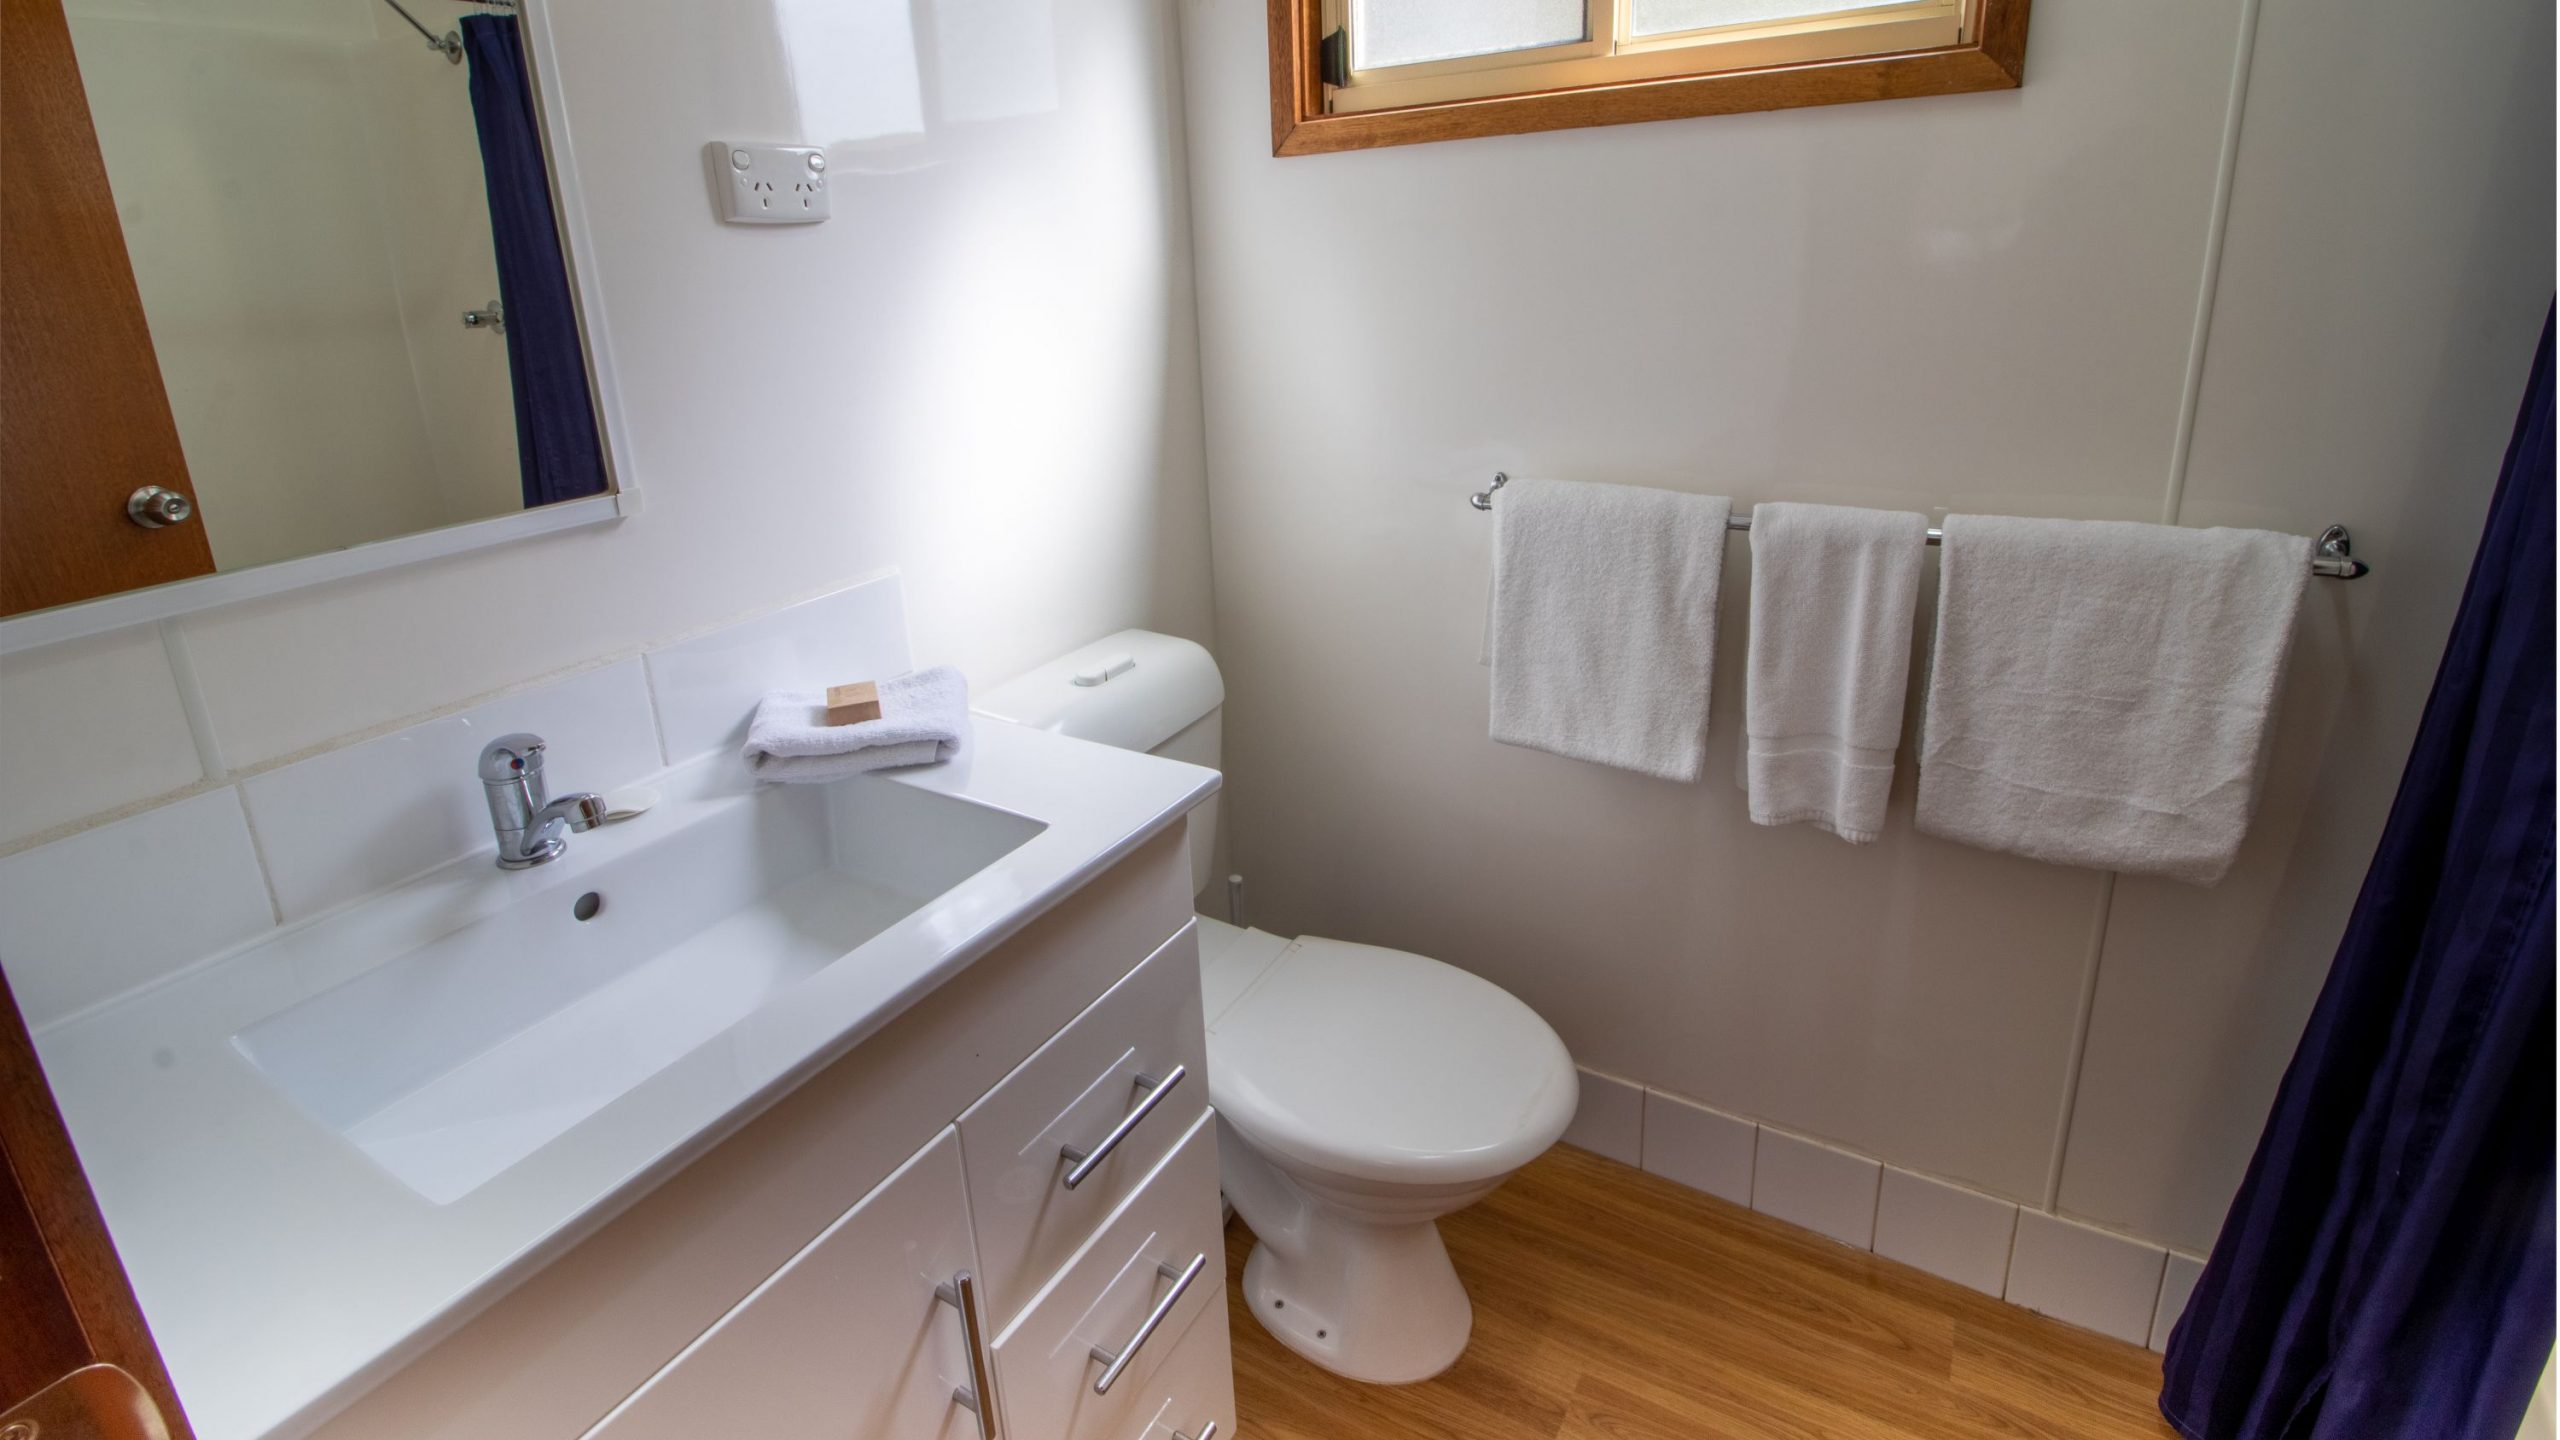 Park cabin bathroom